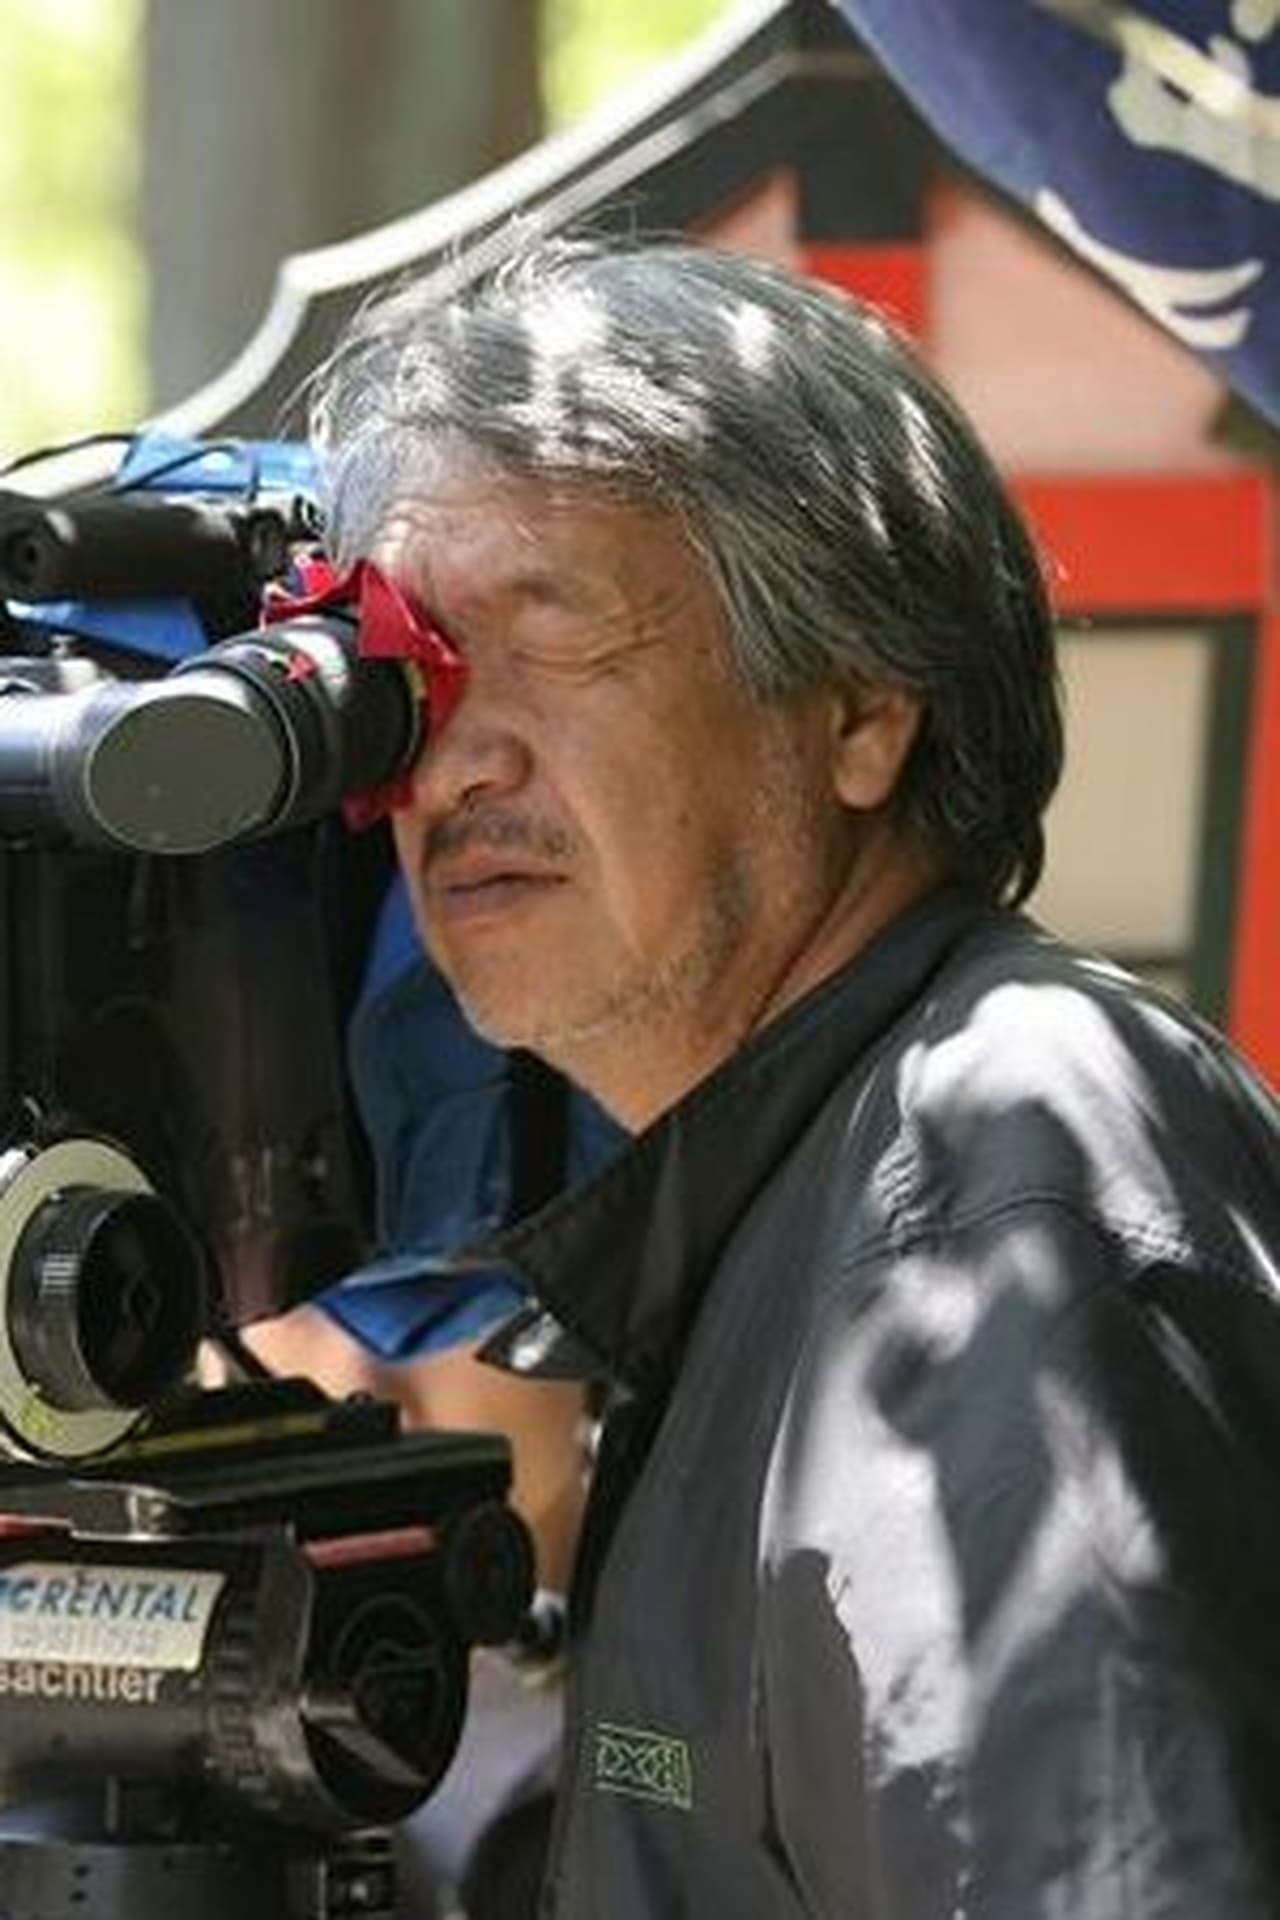 Yutaka Yamazaki